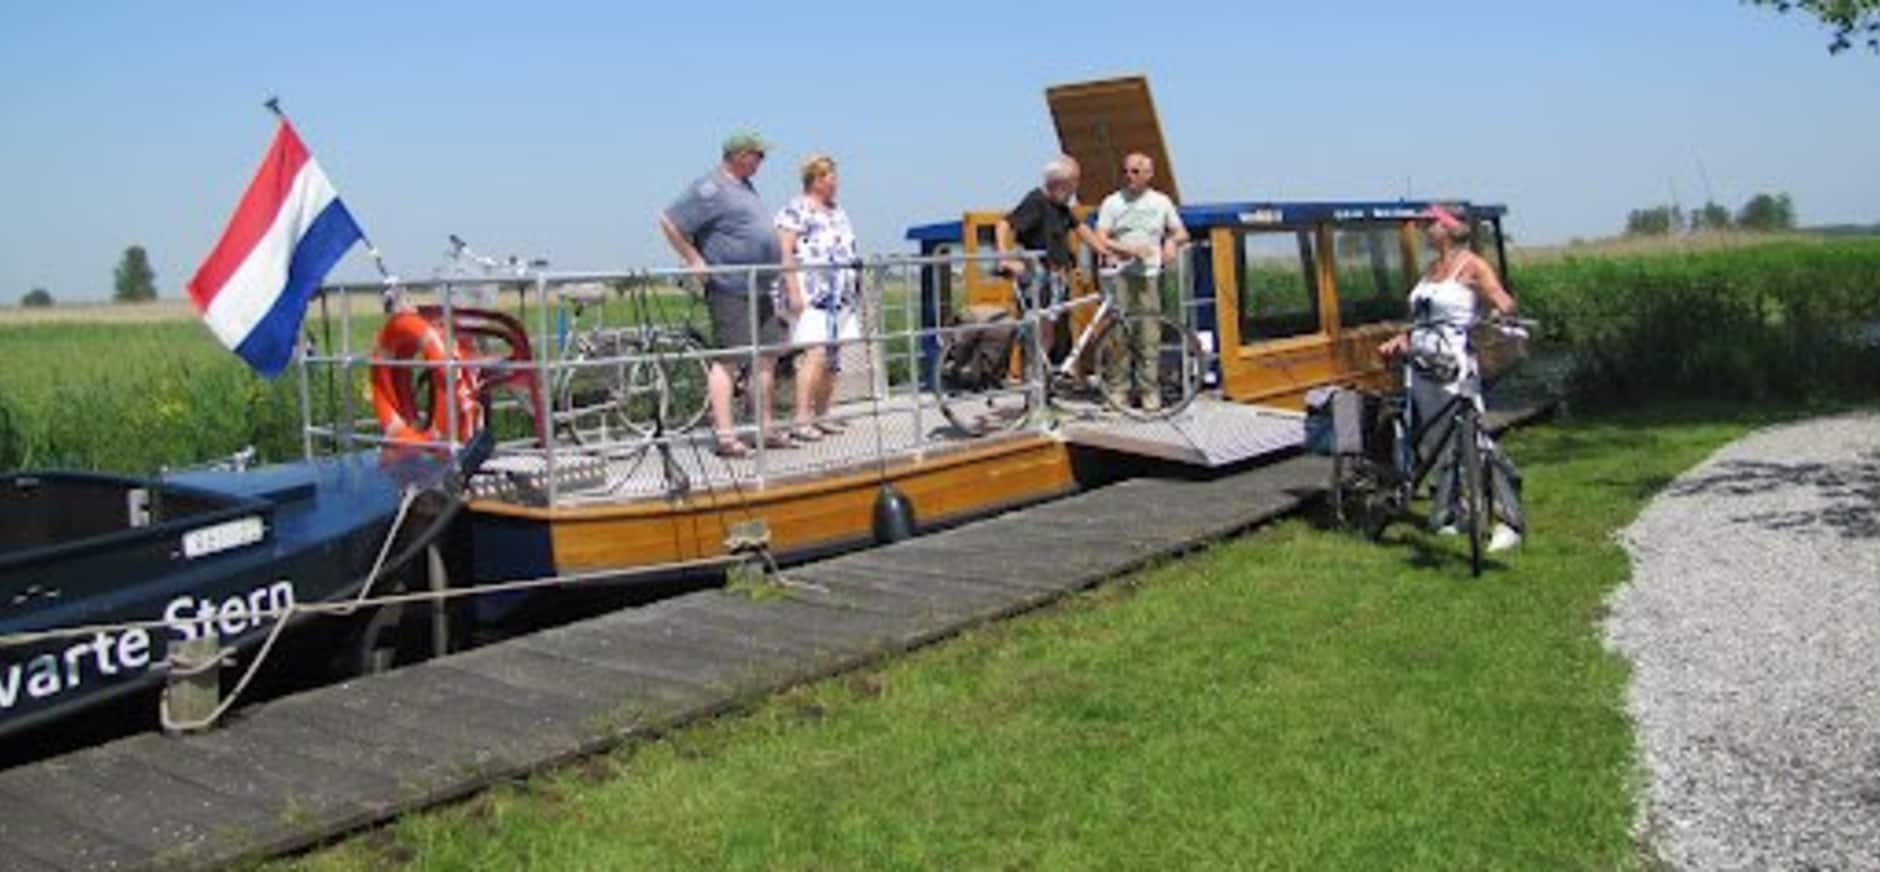 Wegens succes verlengd: Ecowaterliner Blokzijl- Sint Jansklooster